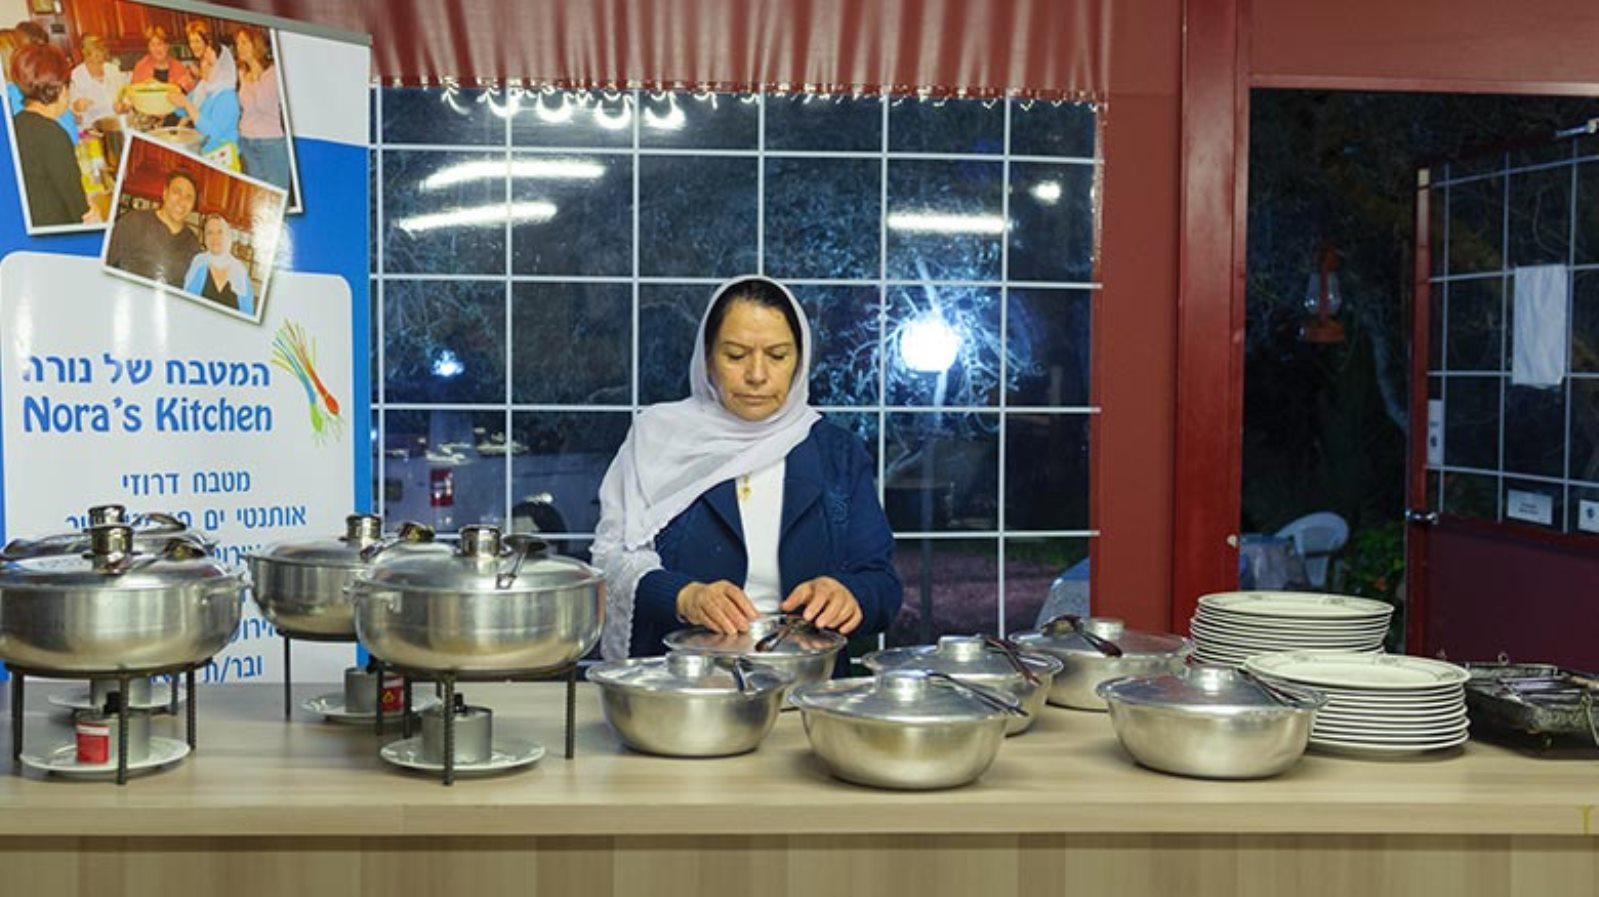 Nurah Husaisi in her restaurant in Daliat el-Carmel. Photo: courtesy